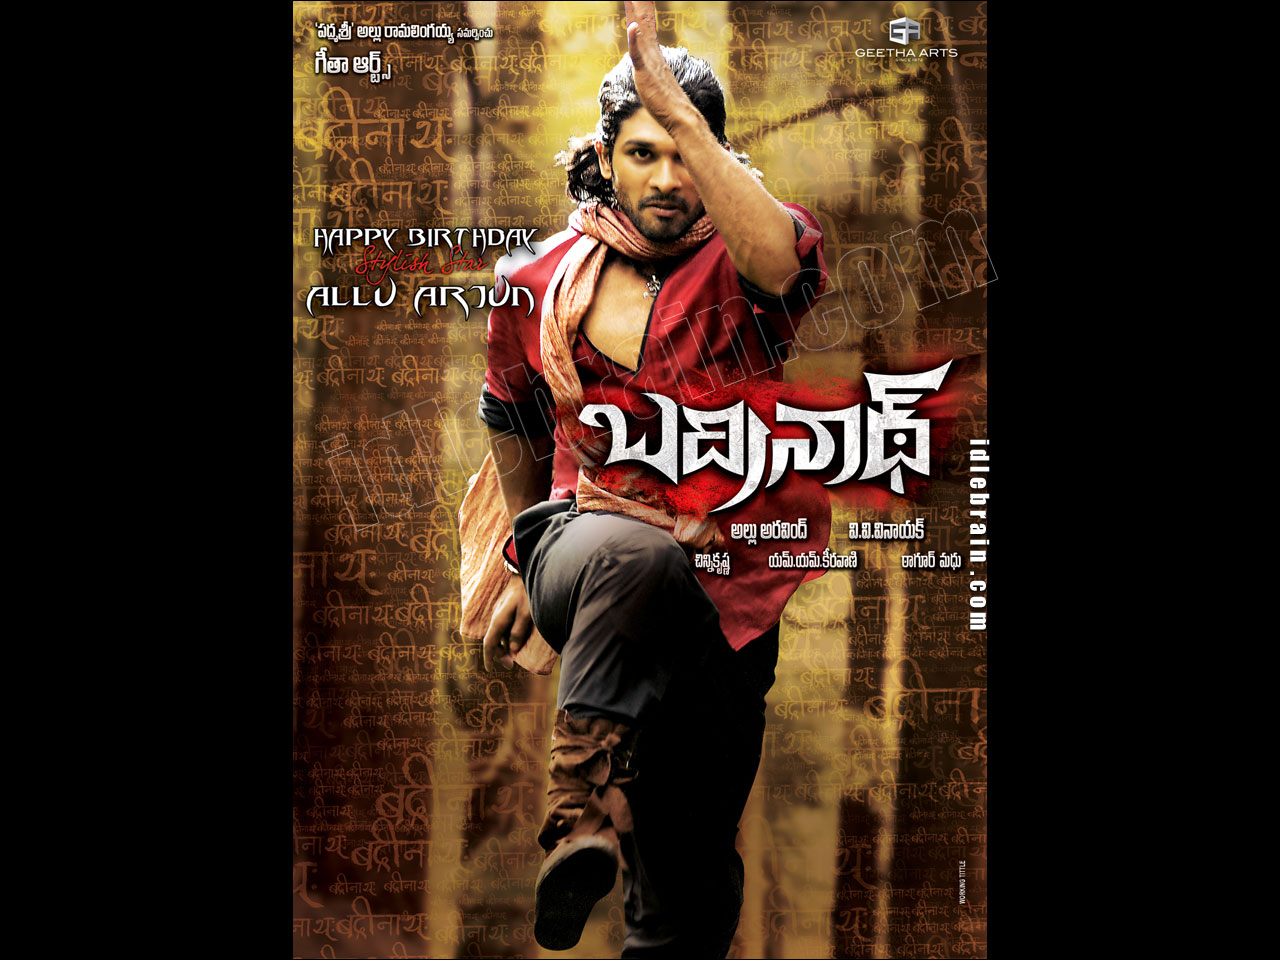 Allu Arjun Badrinath Wallpapers 2011 ~ Hot Movie Photos